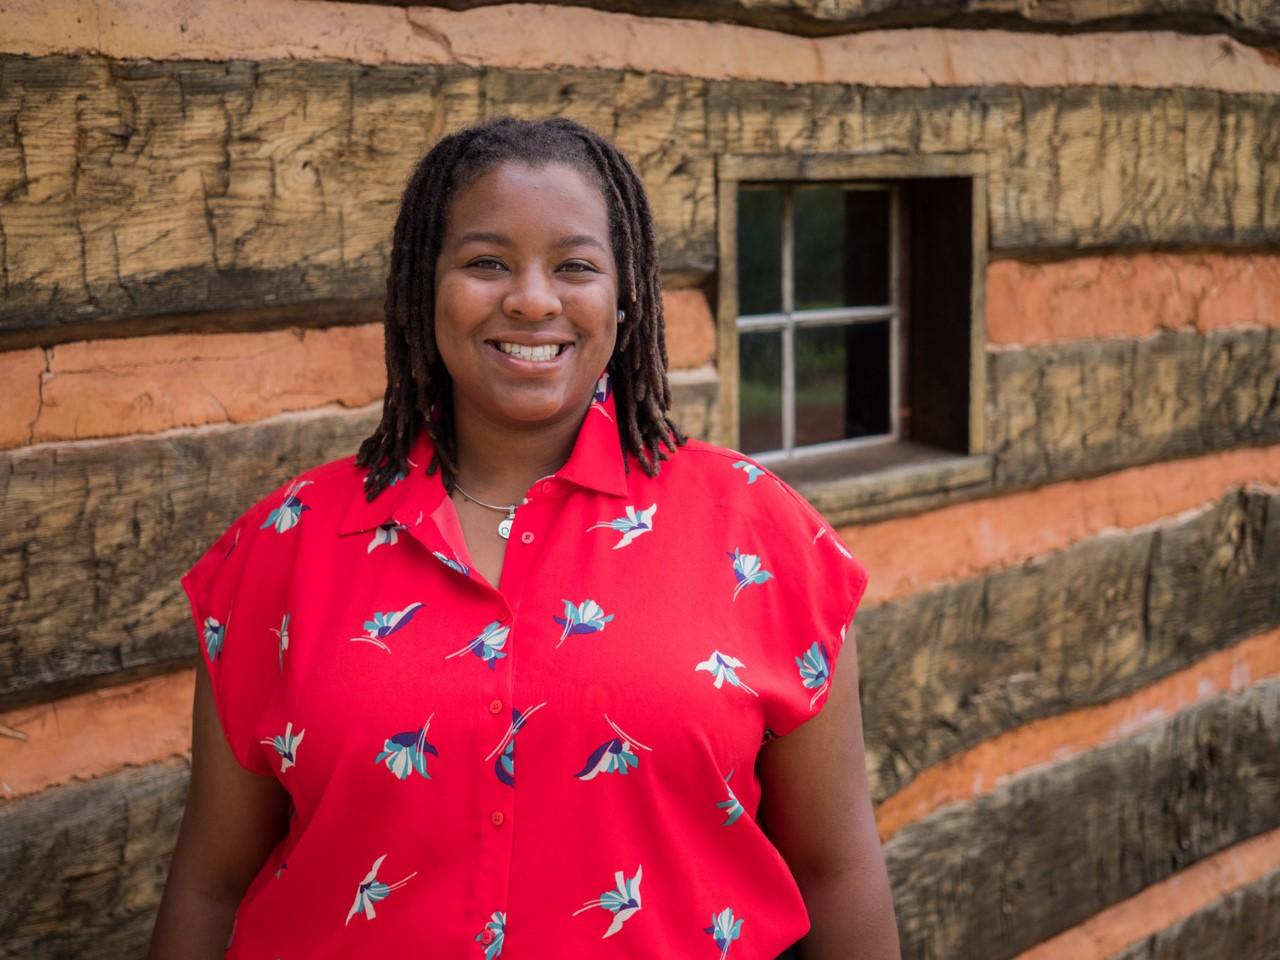 Public Historian Niya Bates on Monticello's African-American history